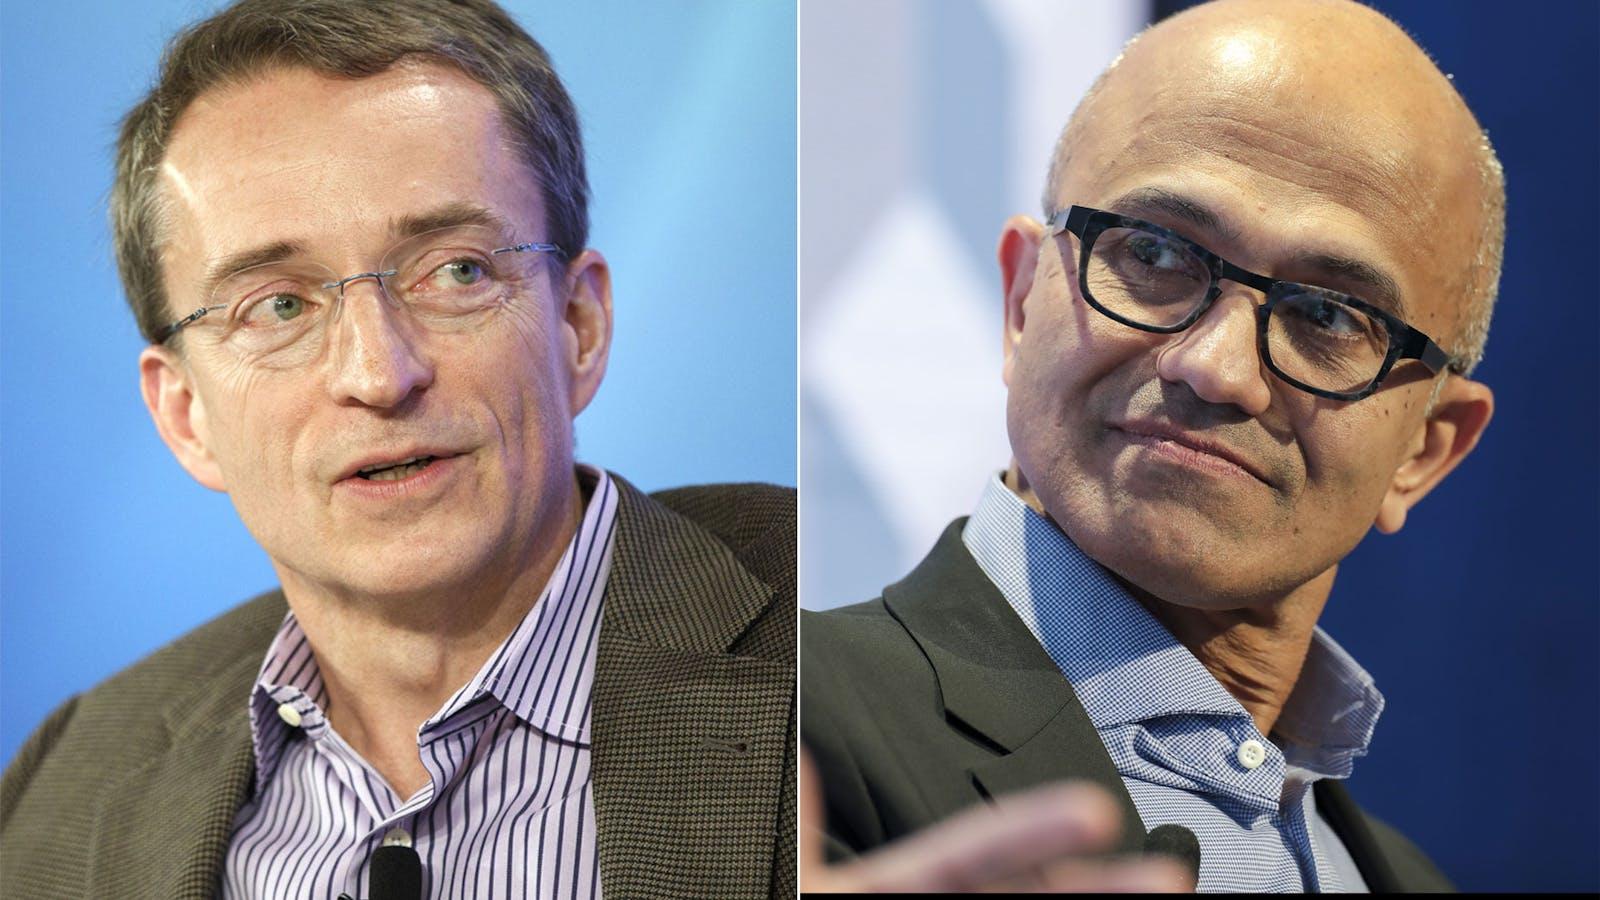 VMware's Pat Gelsinger, left, and Microsoft's Satya Nadella. Photos by Bloomberg.